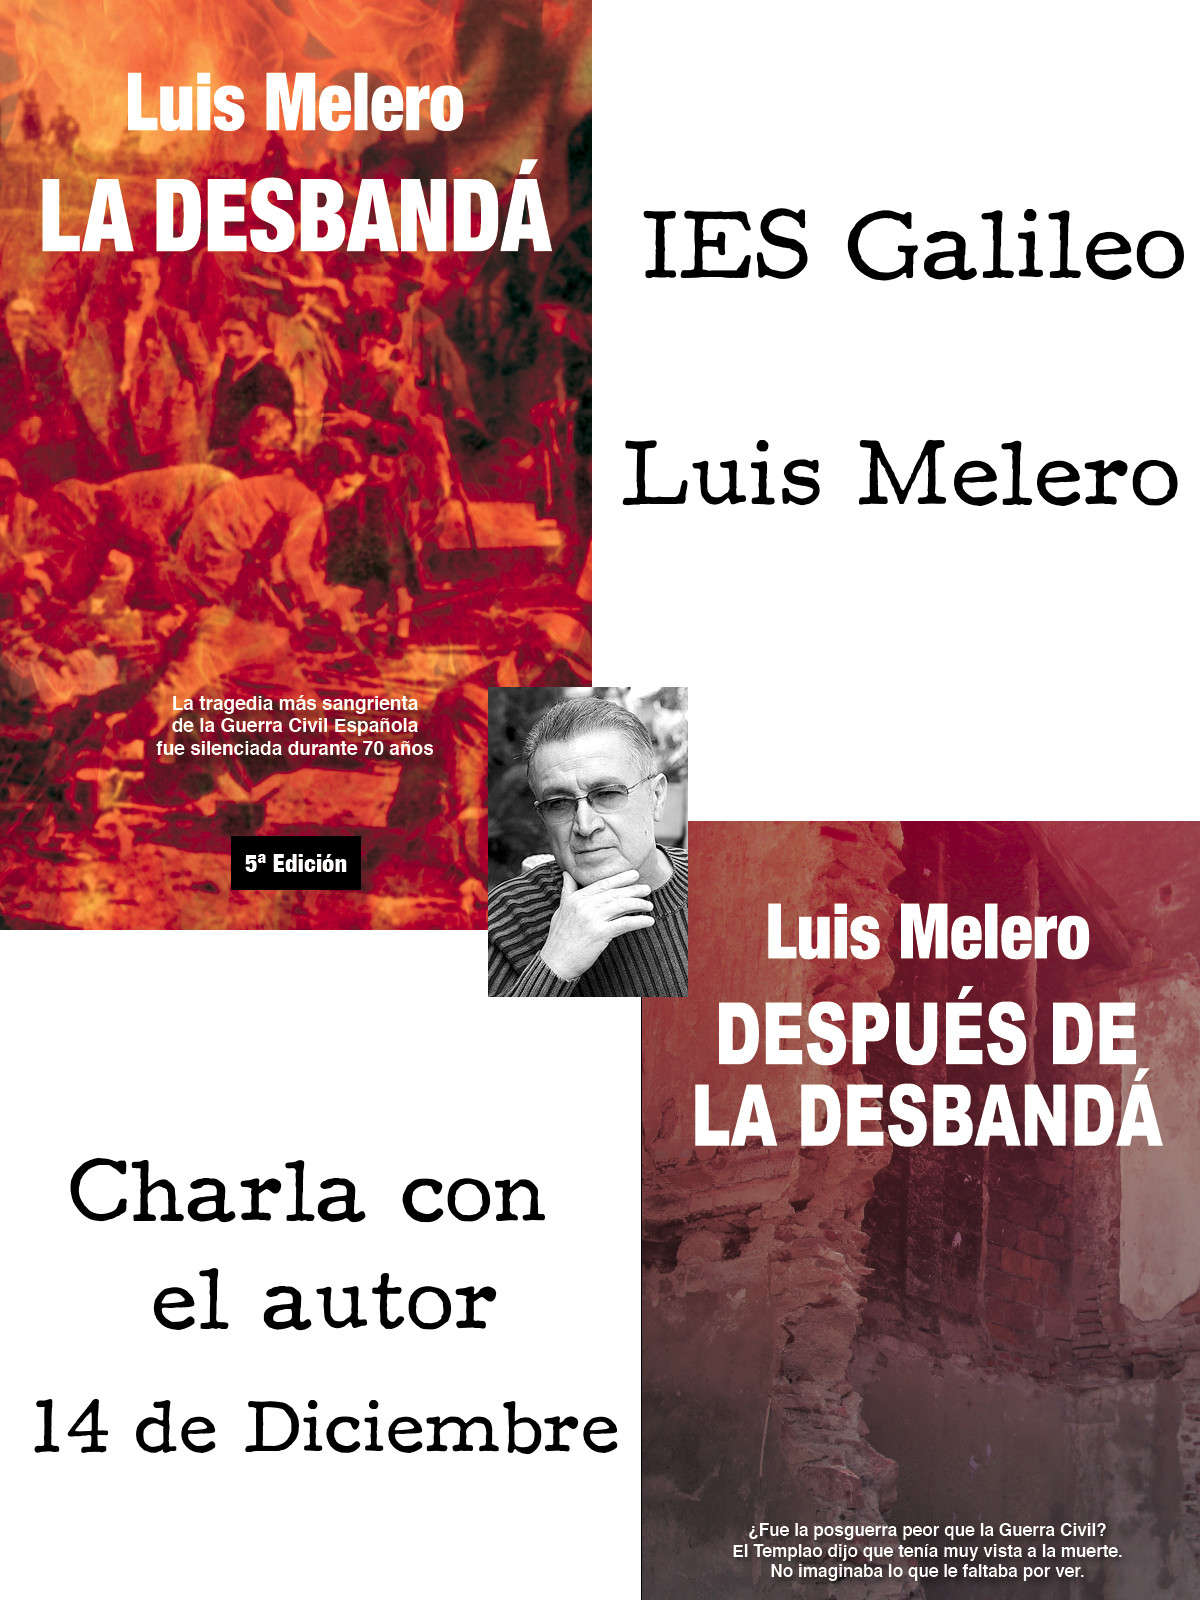 Luis Melero blanco